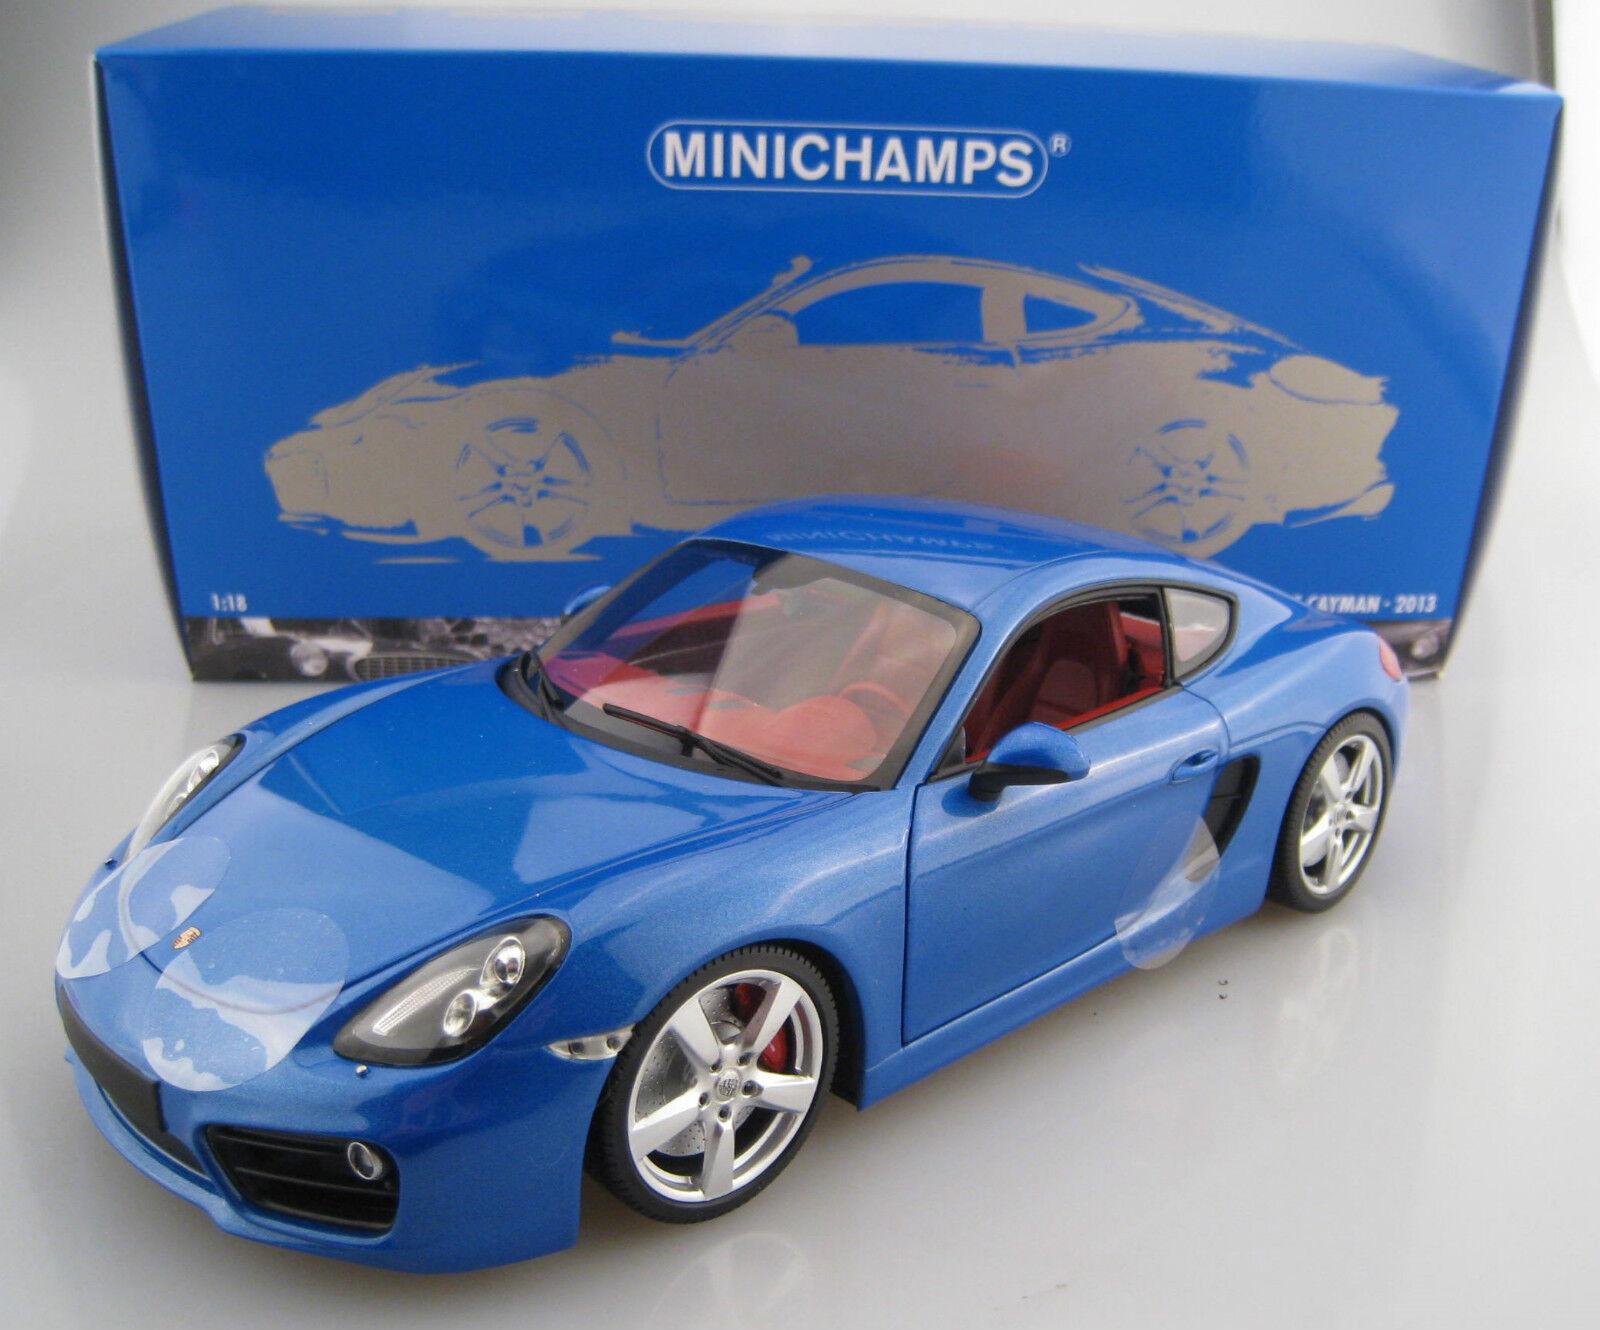 Porsche Cayman 2013 in Bleu Limitée à 504 unités Minichmps 1 18 neuf dans sa boîte NEUF